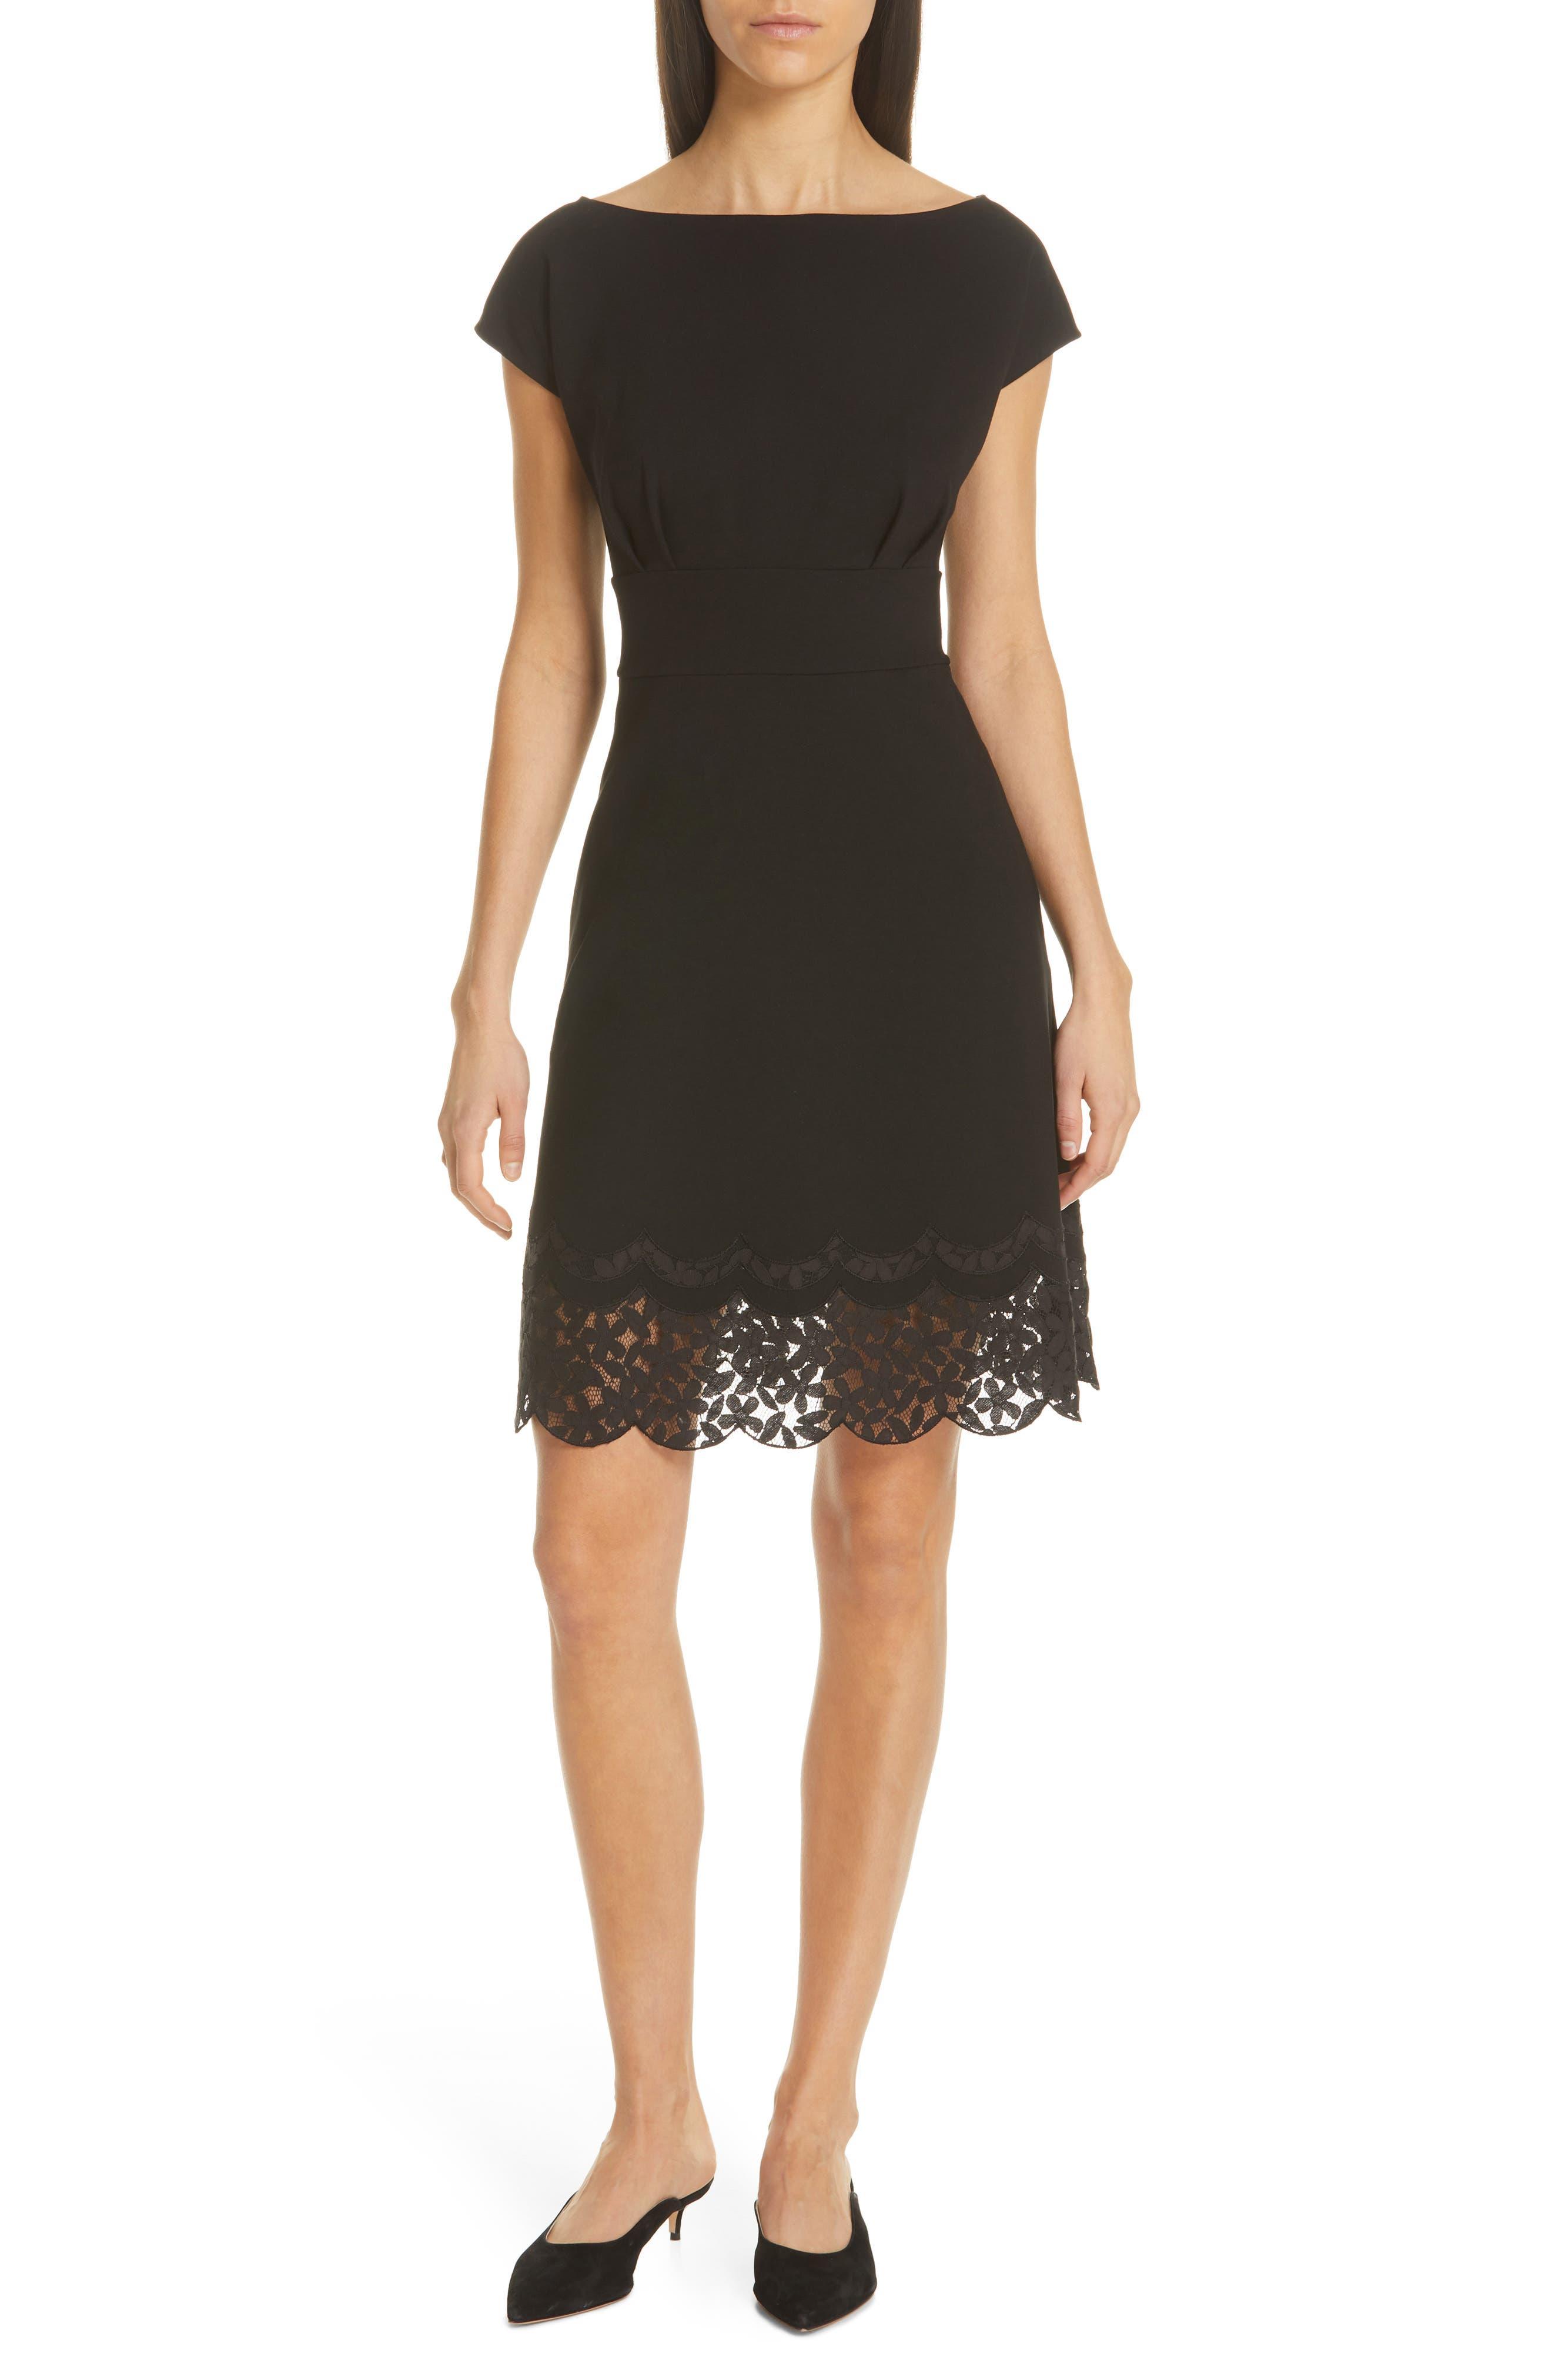 Kate Spade New York Fiorella Lace Trim Dress, Black